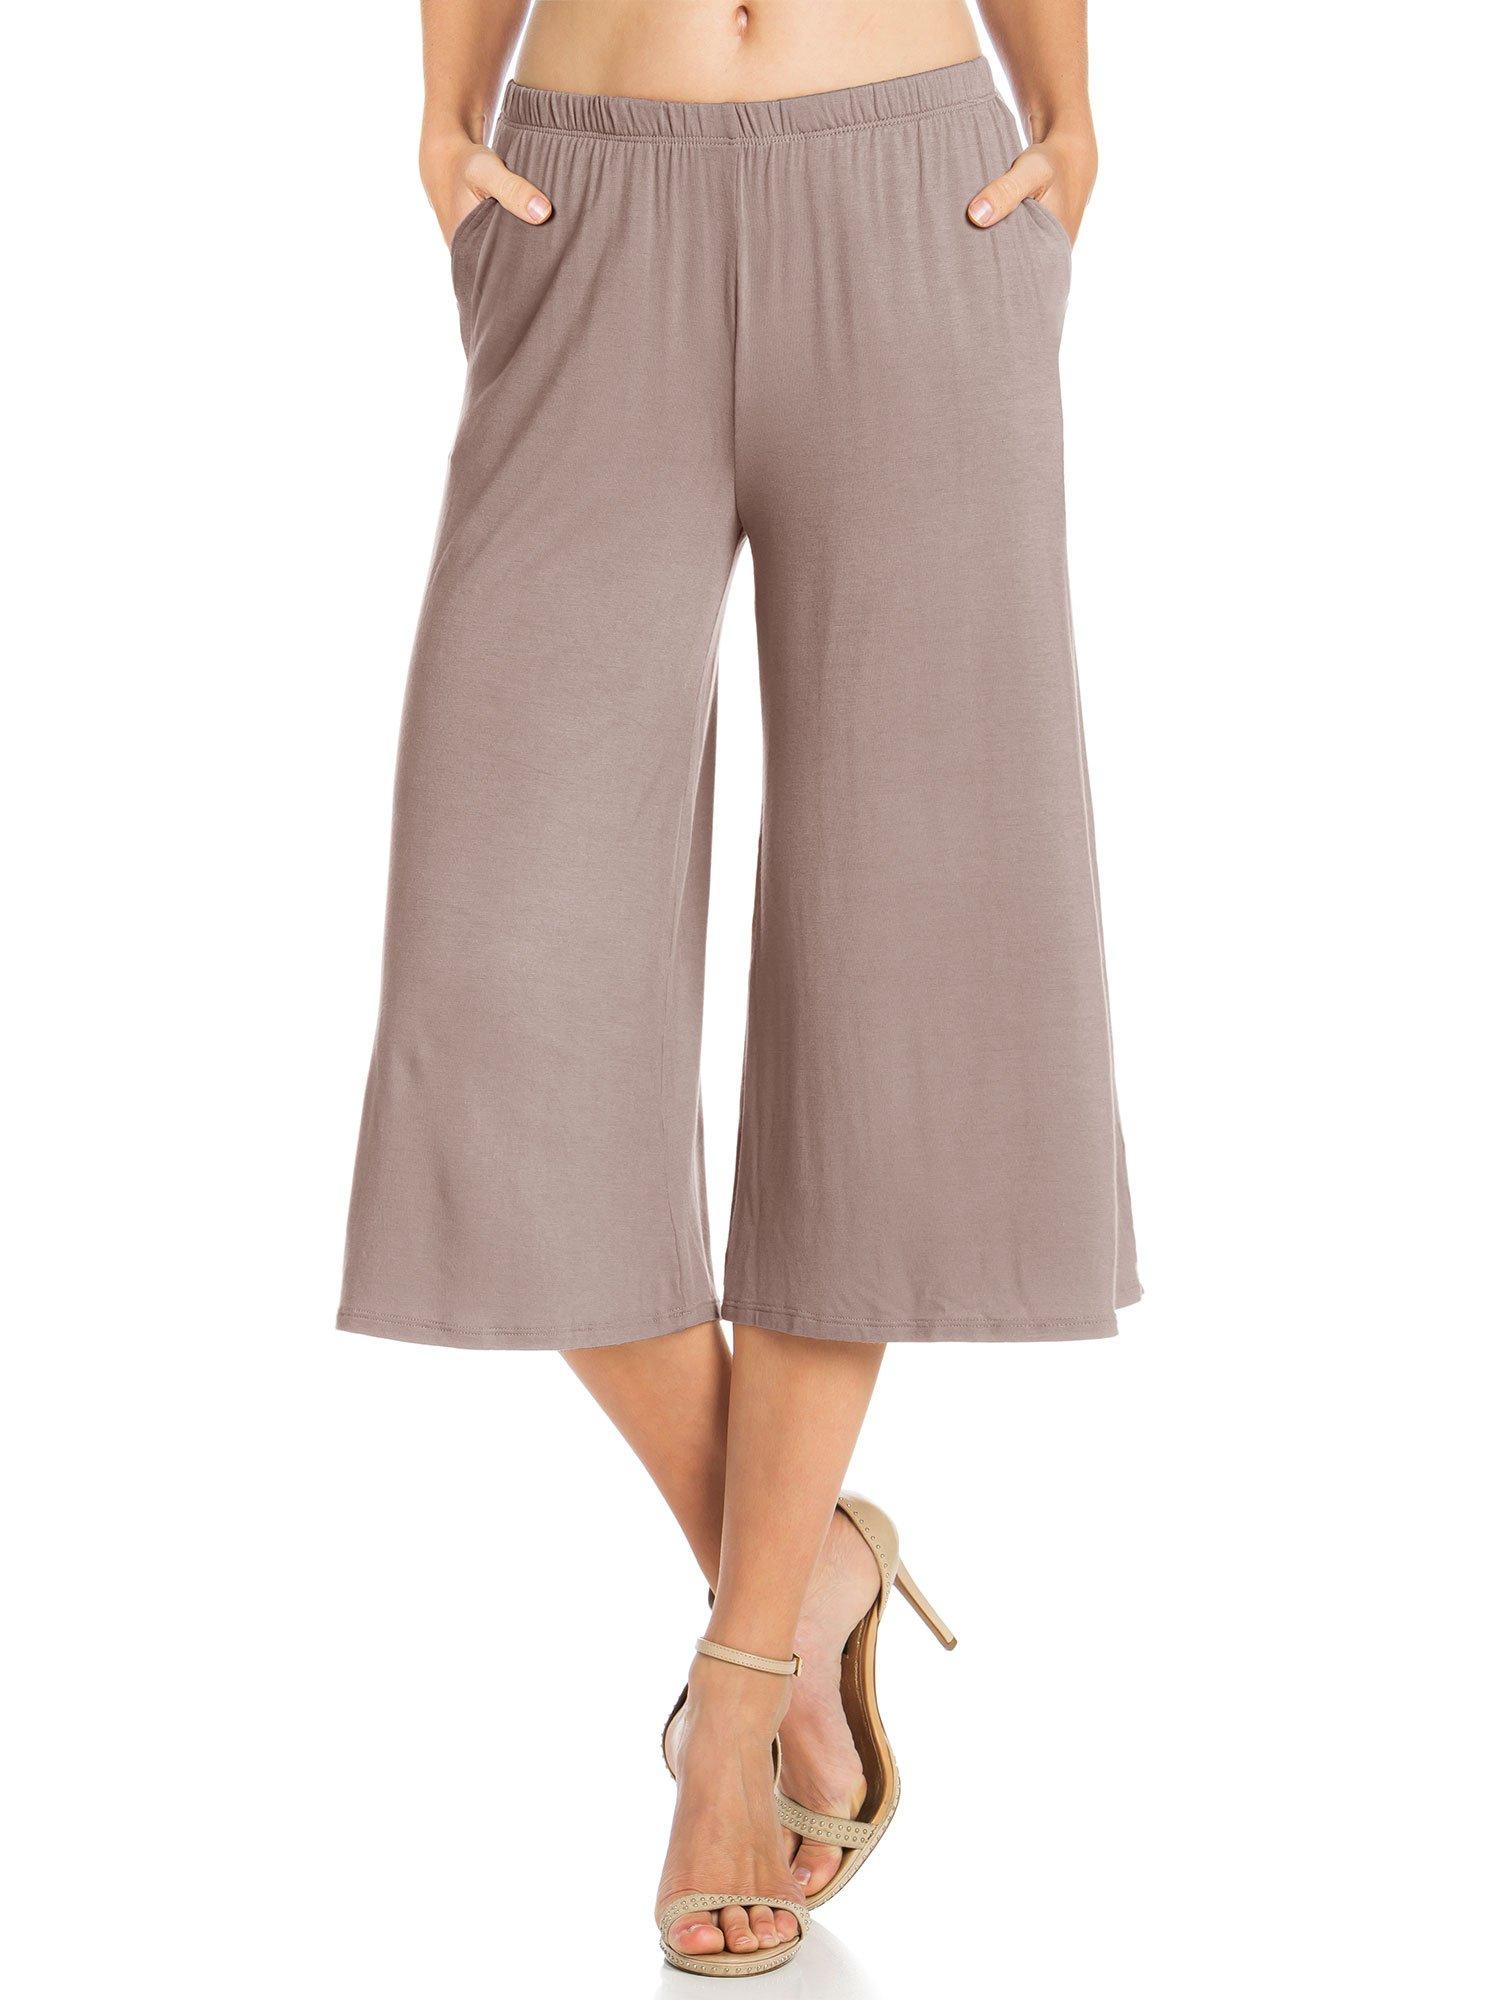 Fashion California Womens 1 Pack Elastic Waist Jersey Culottes Capri Pocket Pants (XXXXX-Large, Mocha)